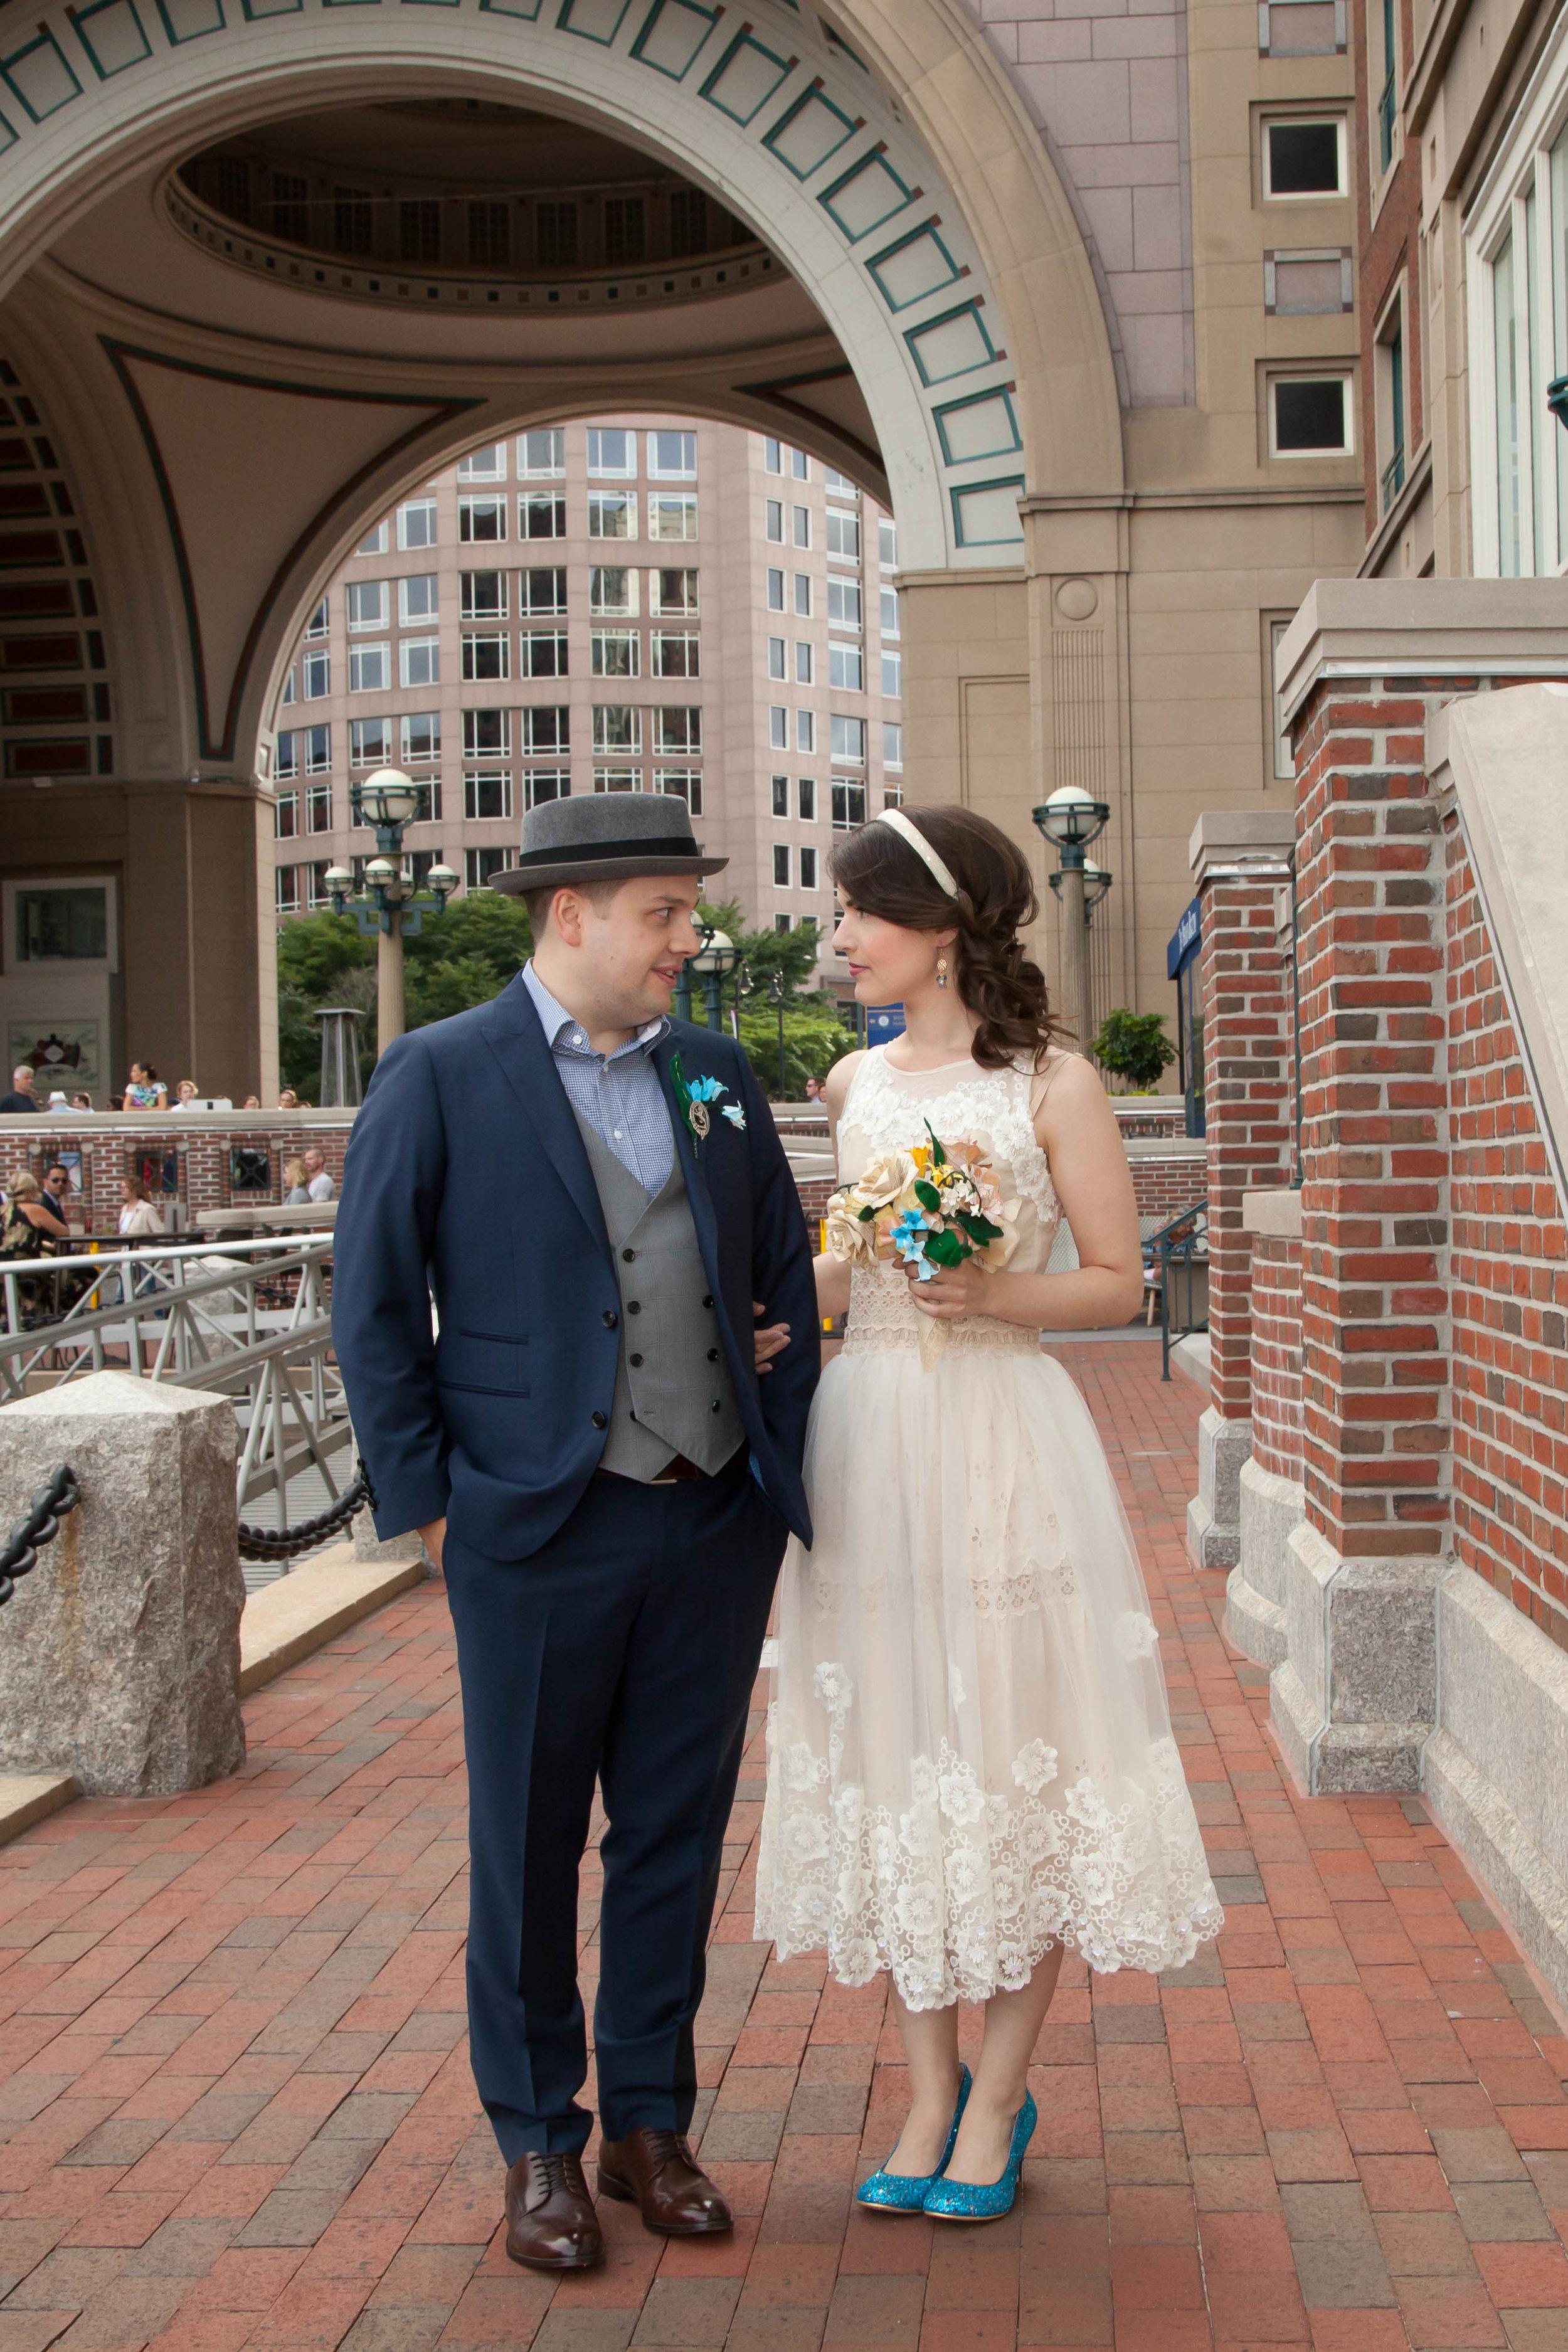 032_wedding_MaraBrod2018.jpg